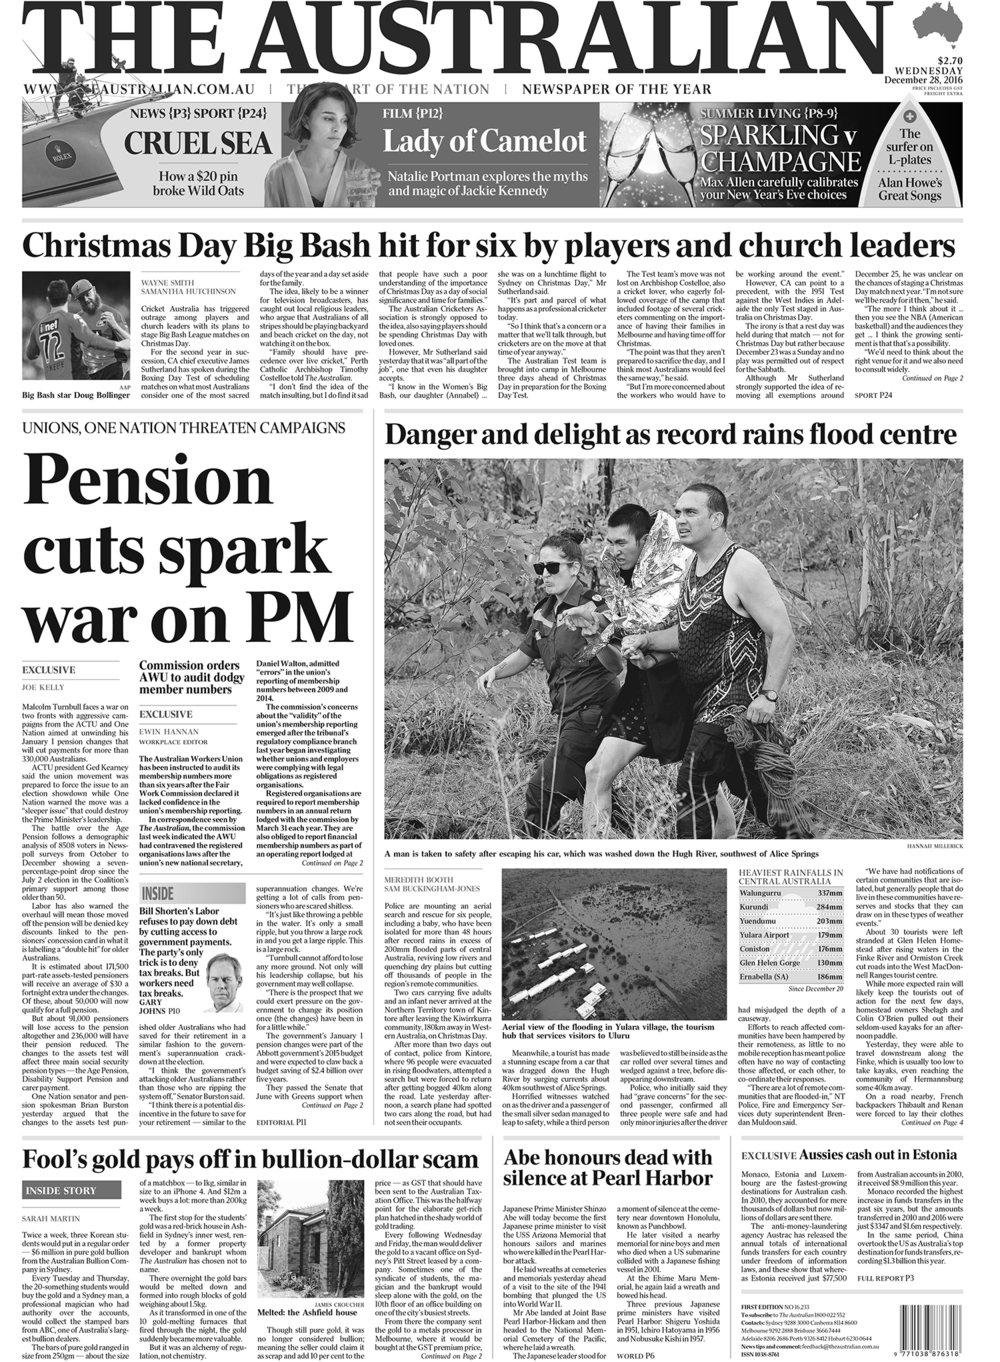 161228 Aus front page.jpg